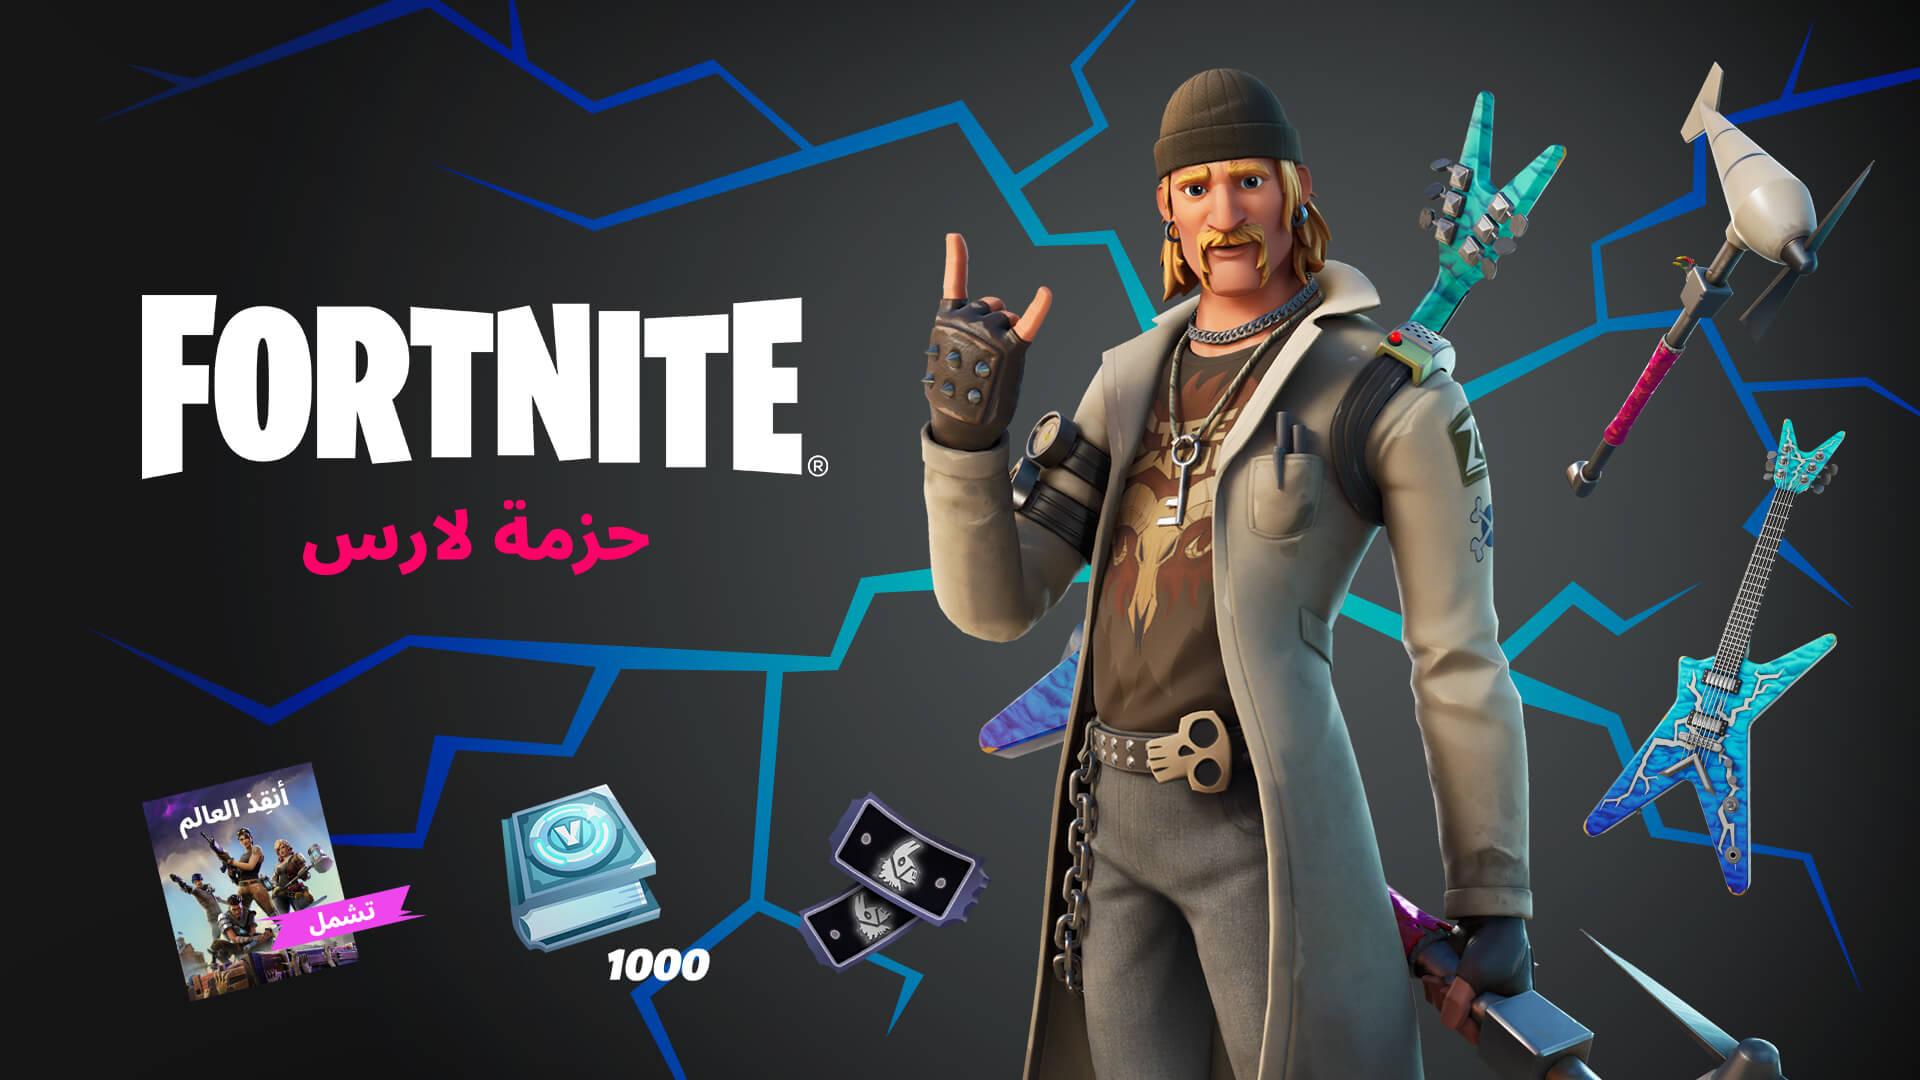 ar-fortnite-save-the-world-lars-pack